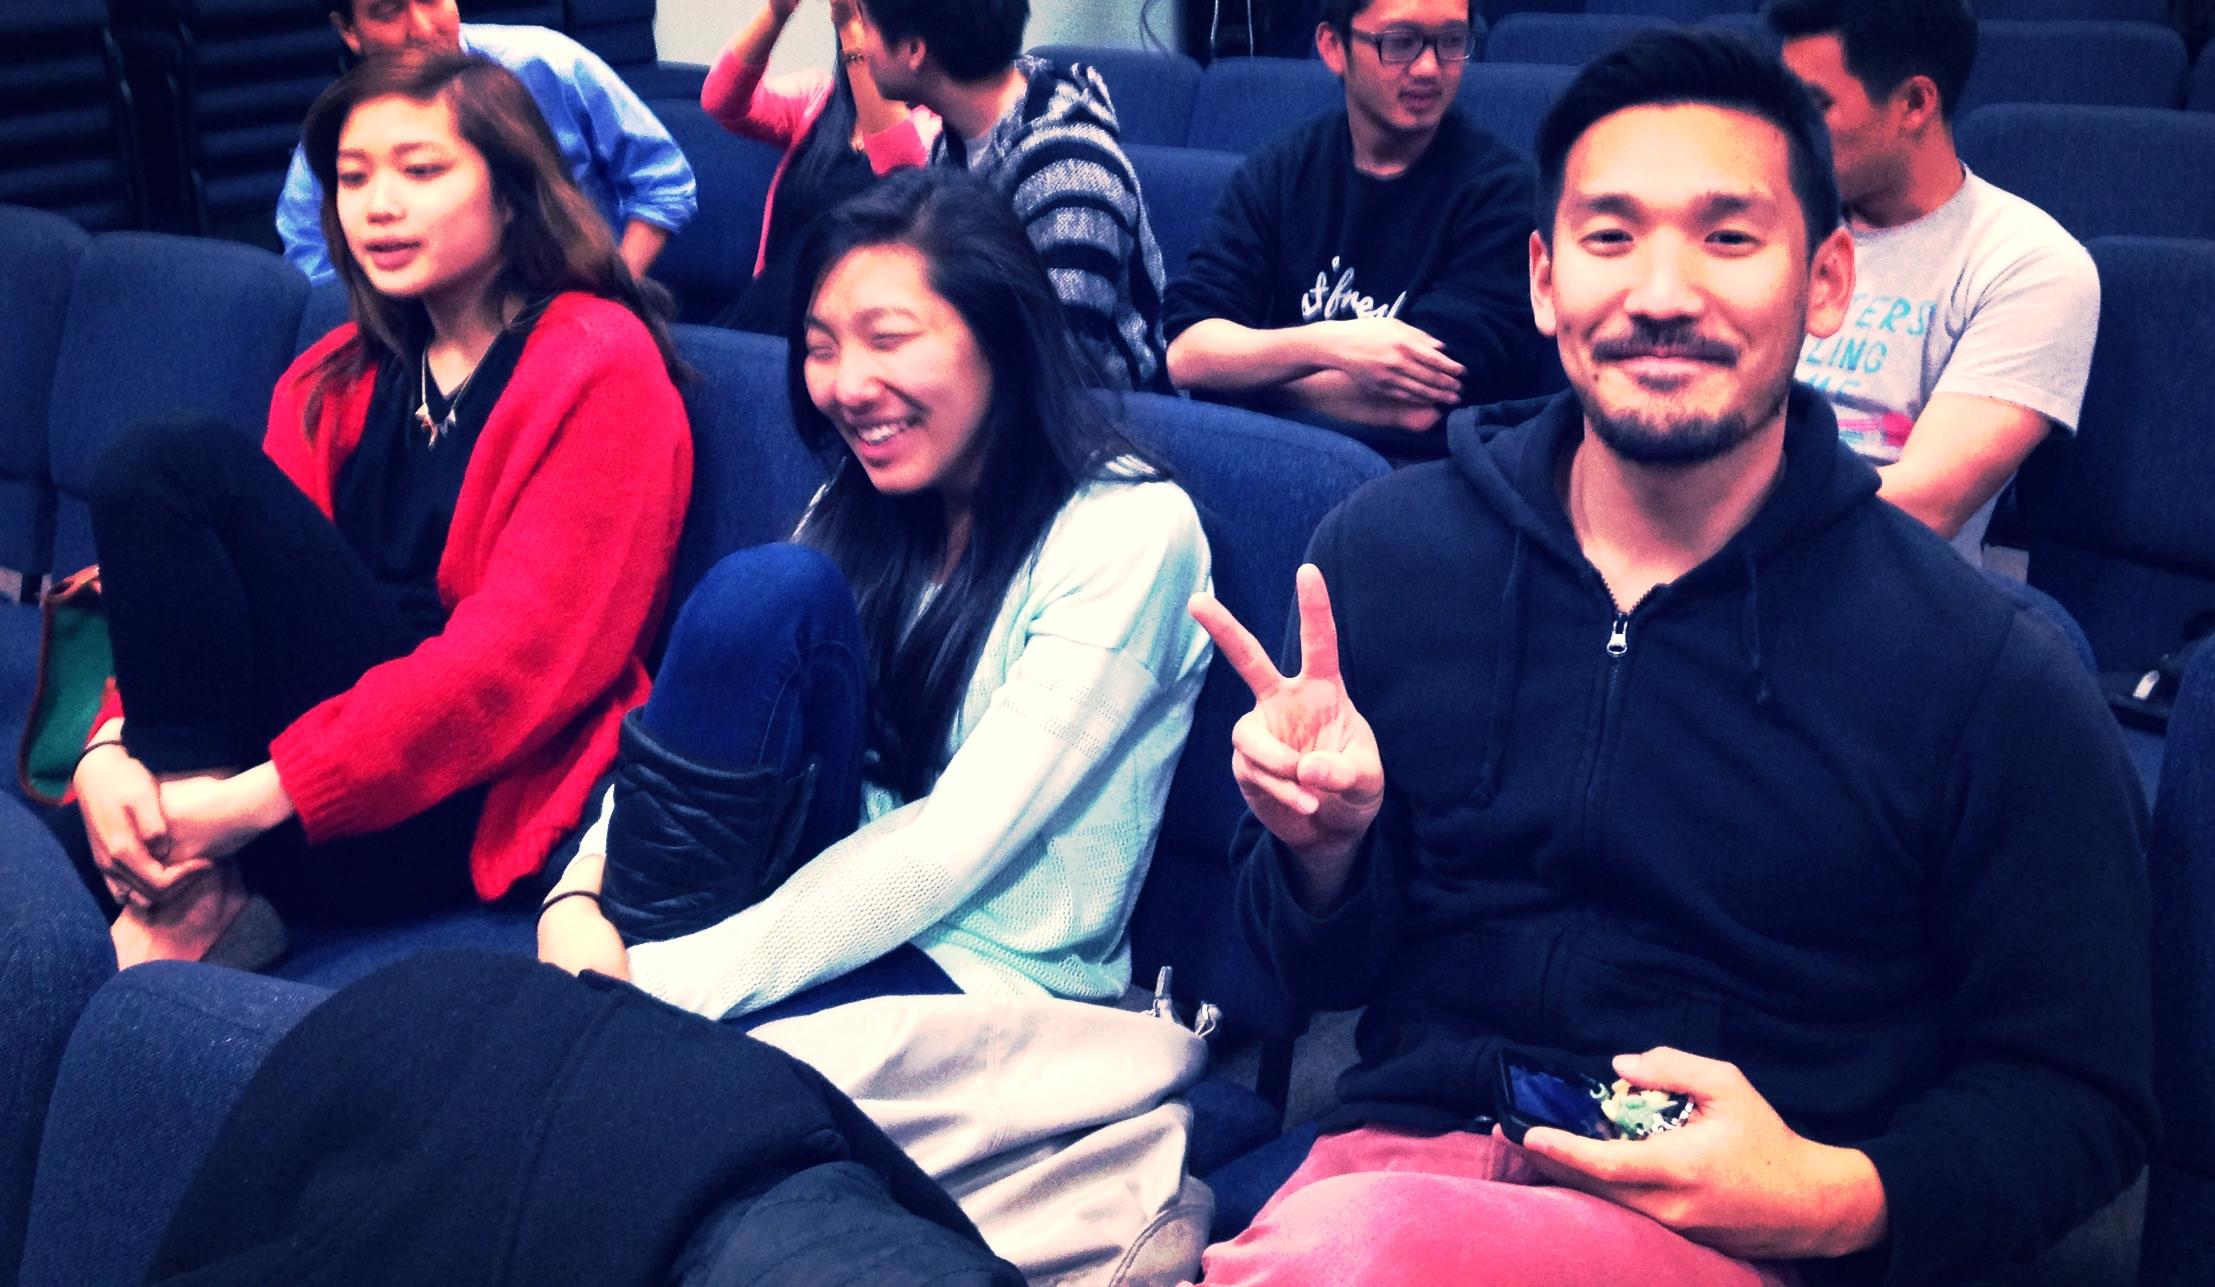 Look it's keyboardist Sally (L) and lead singer Alex (R) © 2015 Sophia Chang